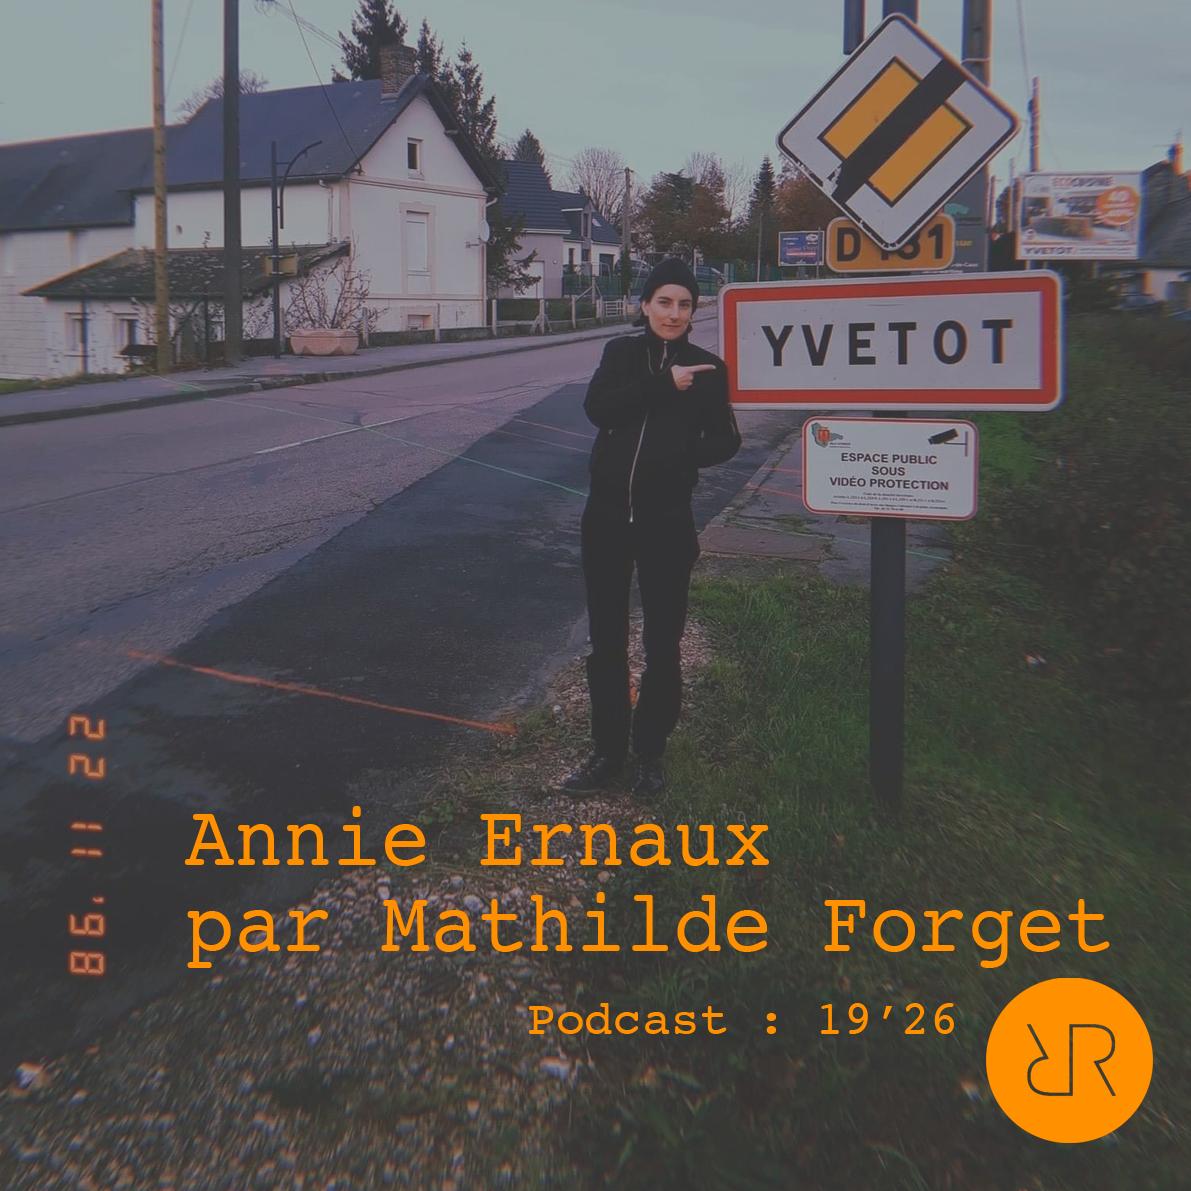 Podcast : Annie Ernaux par Mathilde Forget